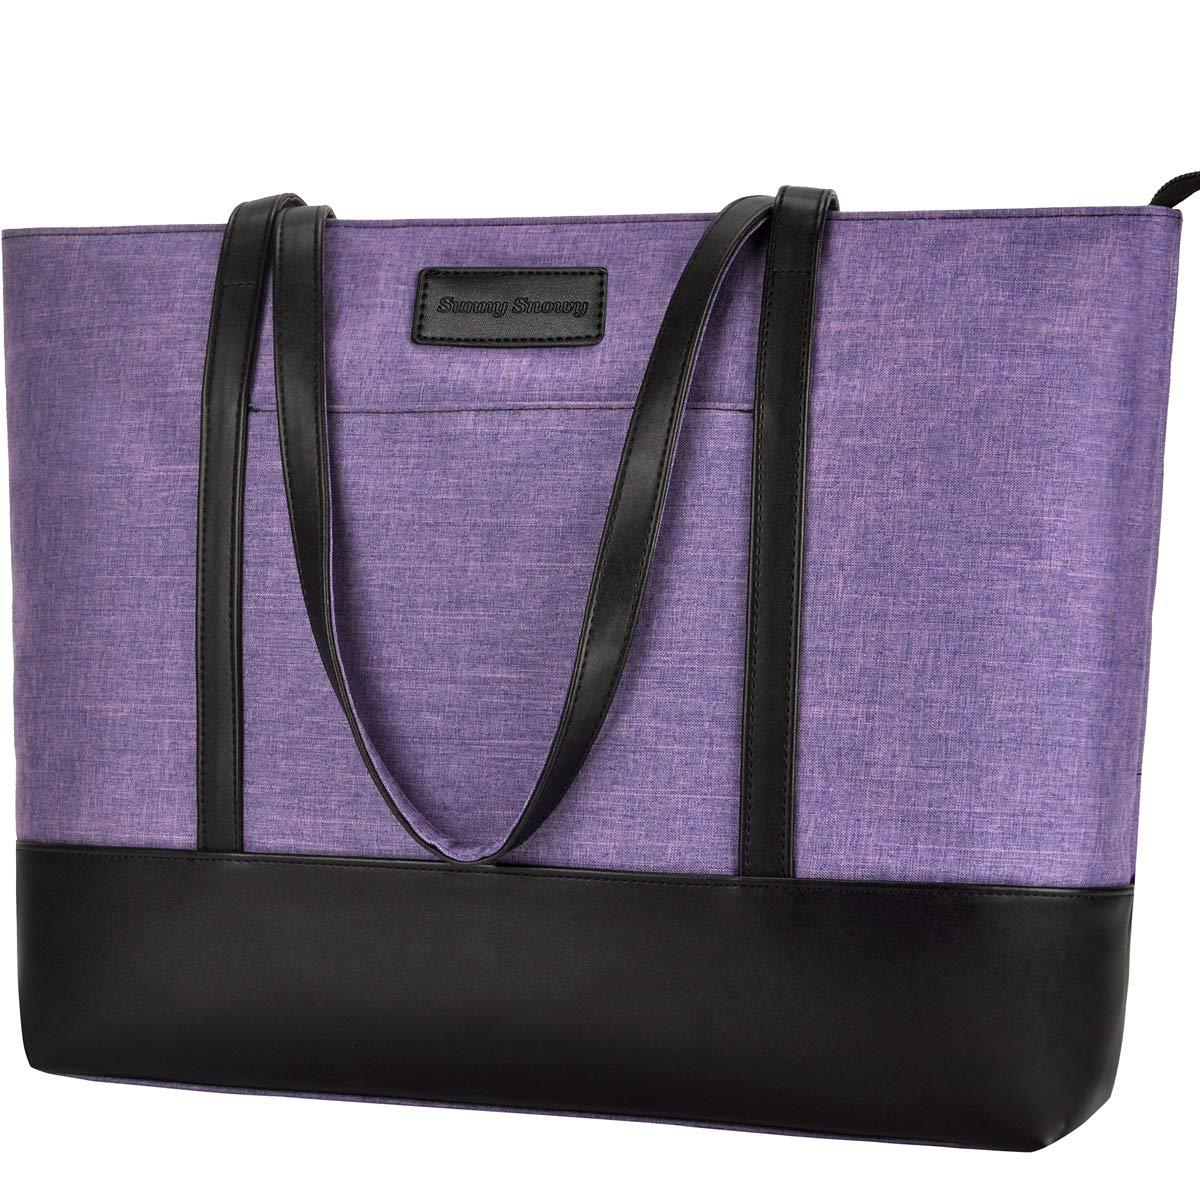 15-15.6 Laptop Tote Bag,Lightweight Water Resistant Nylon Laptop Bag for Woman[Purple]